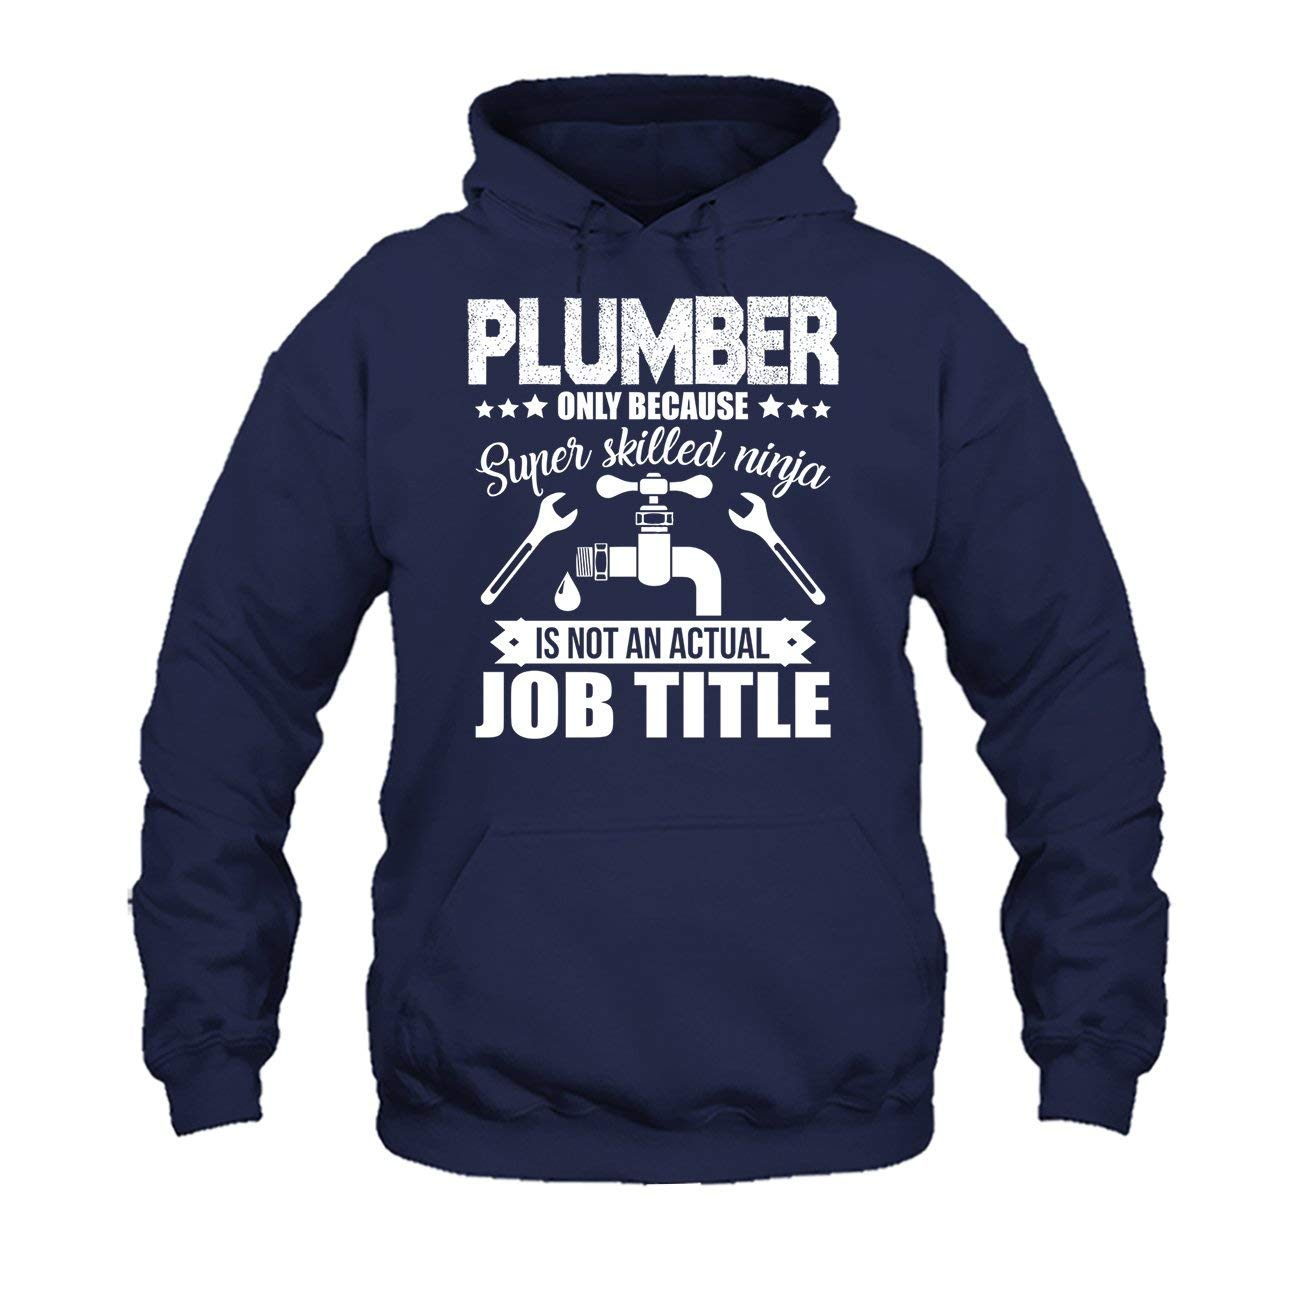 Hoodie AreFrog Plumber Job Title Tee Shirt Sweatshirt